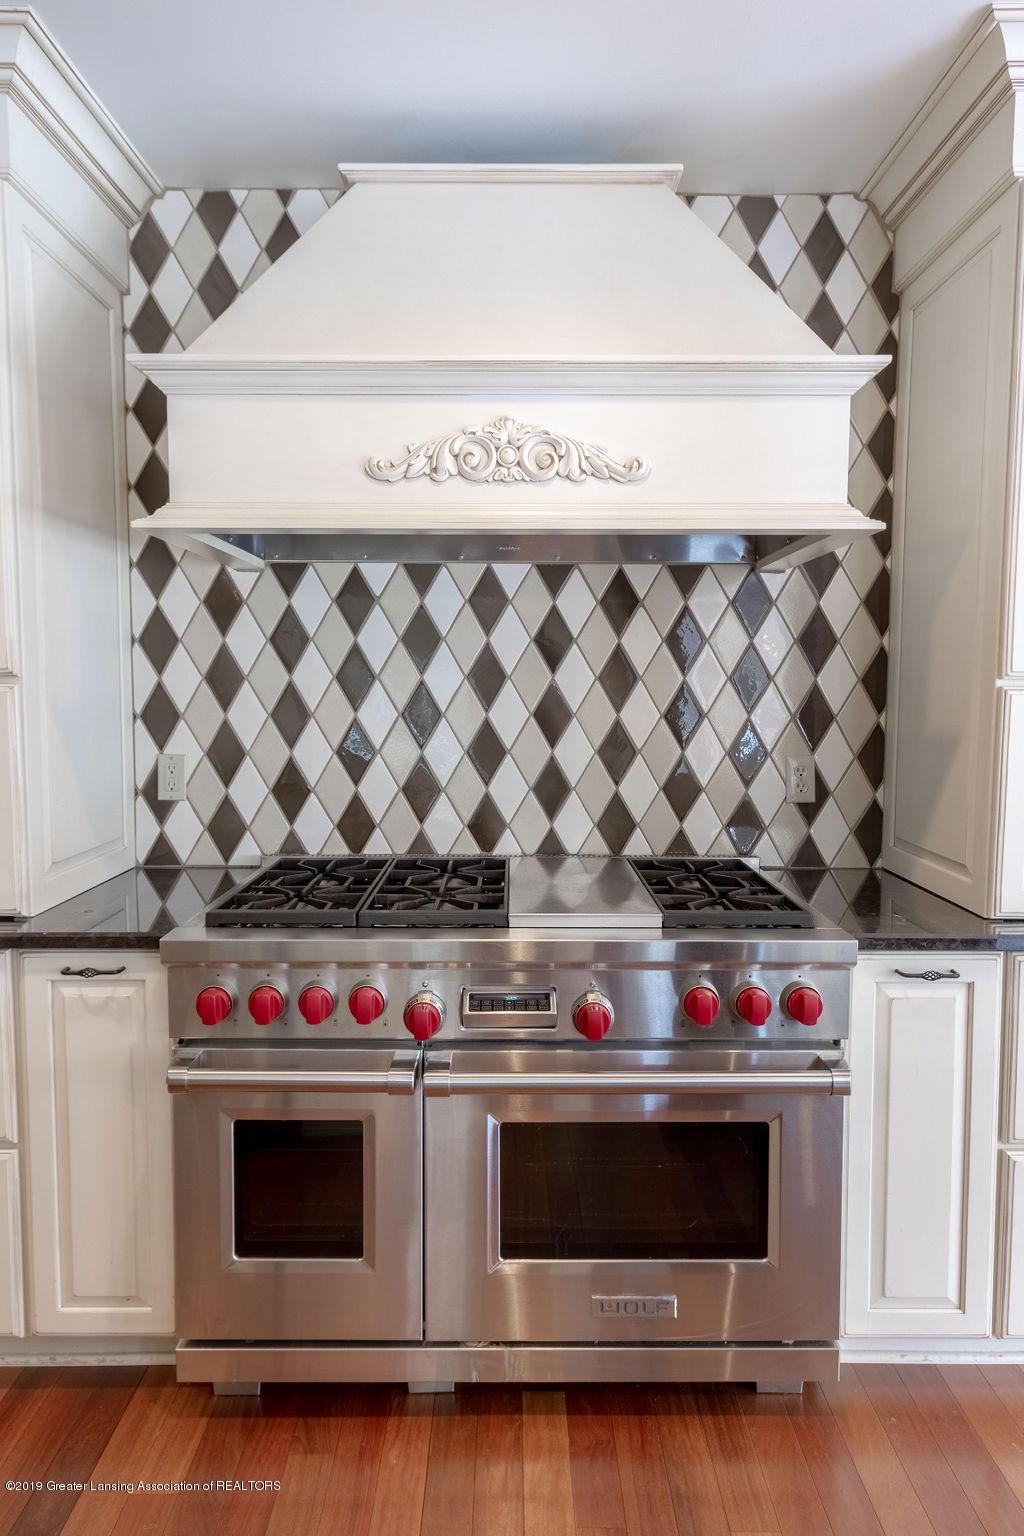 1456 Meadowbrook Ln - range/stove - 12